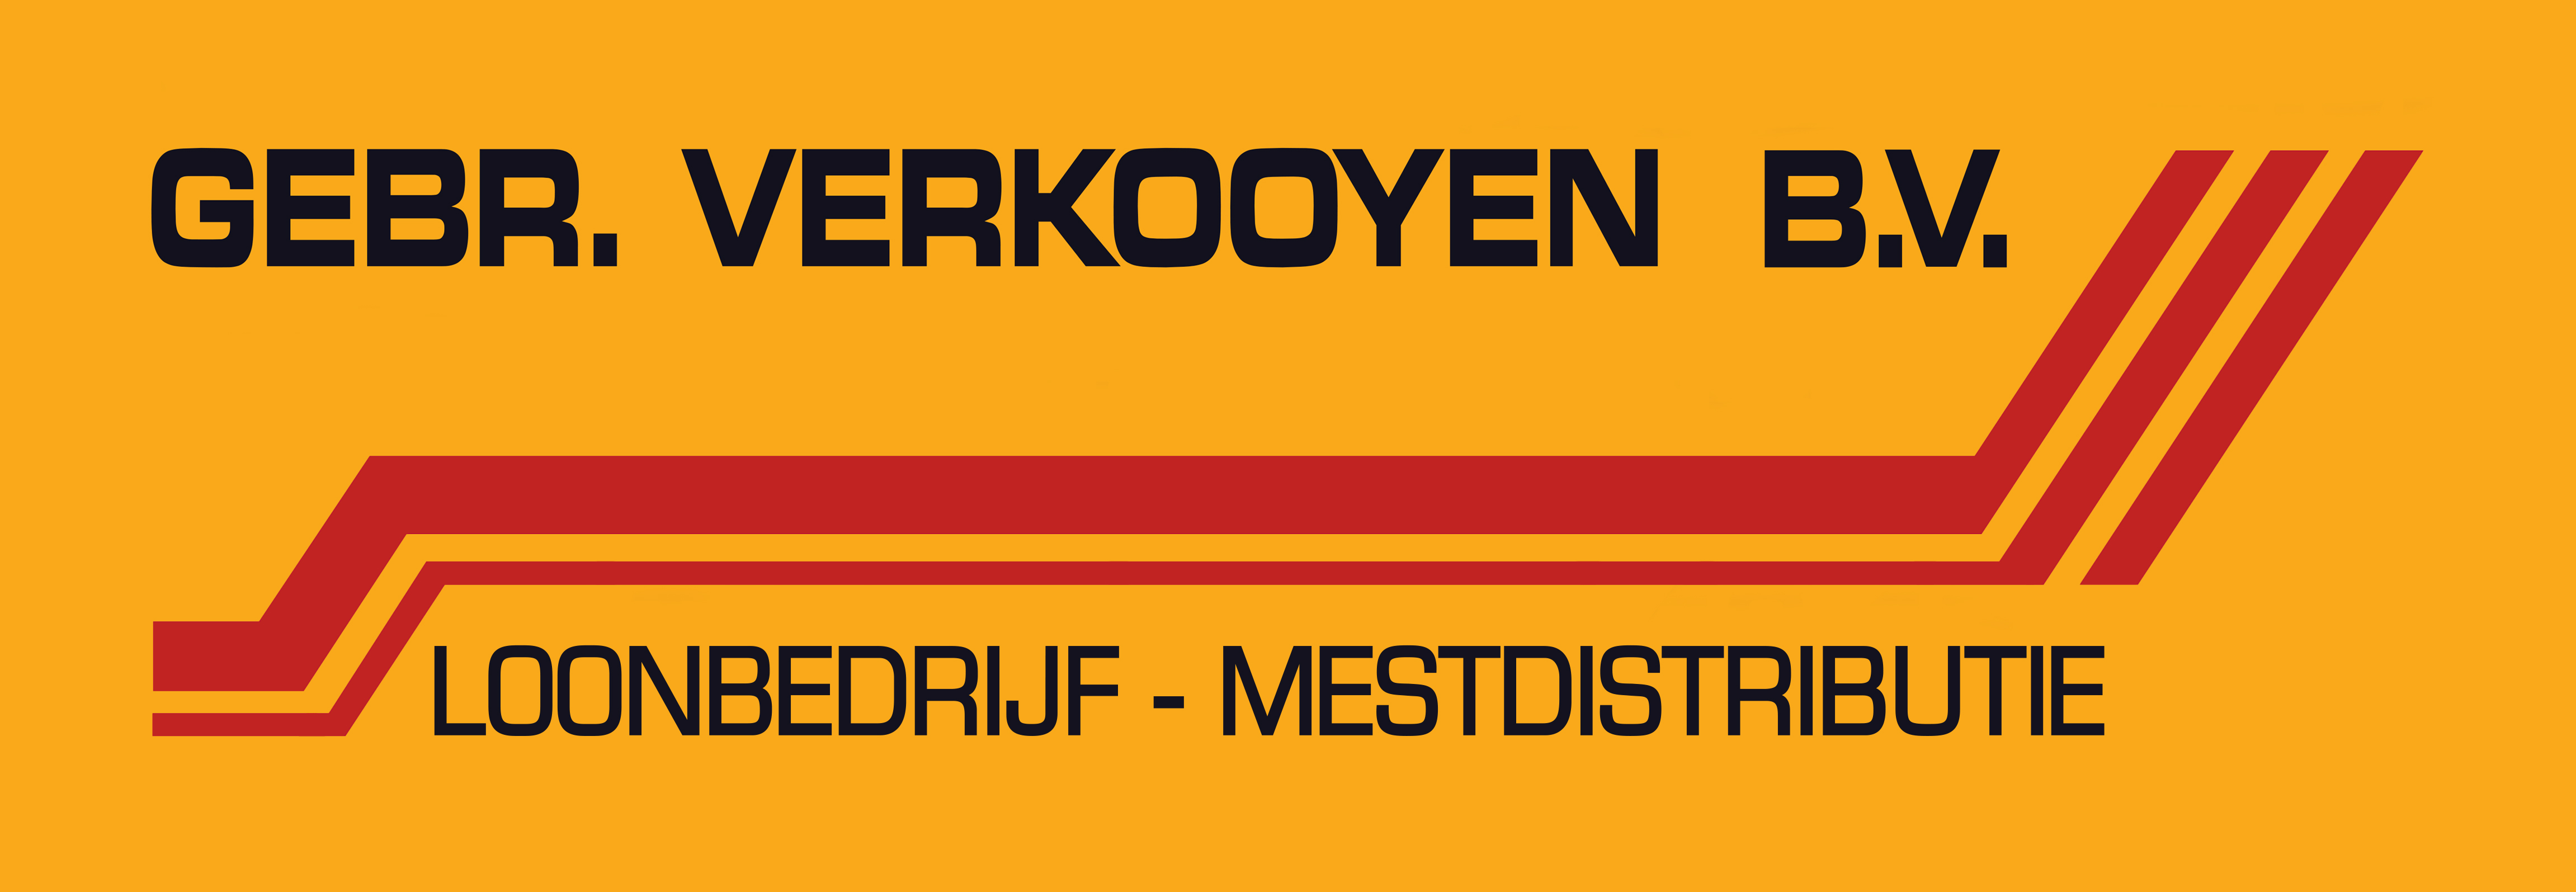 Gebr. Verkooyen B.V.